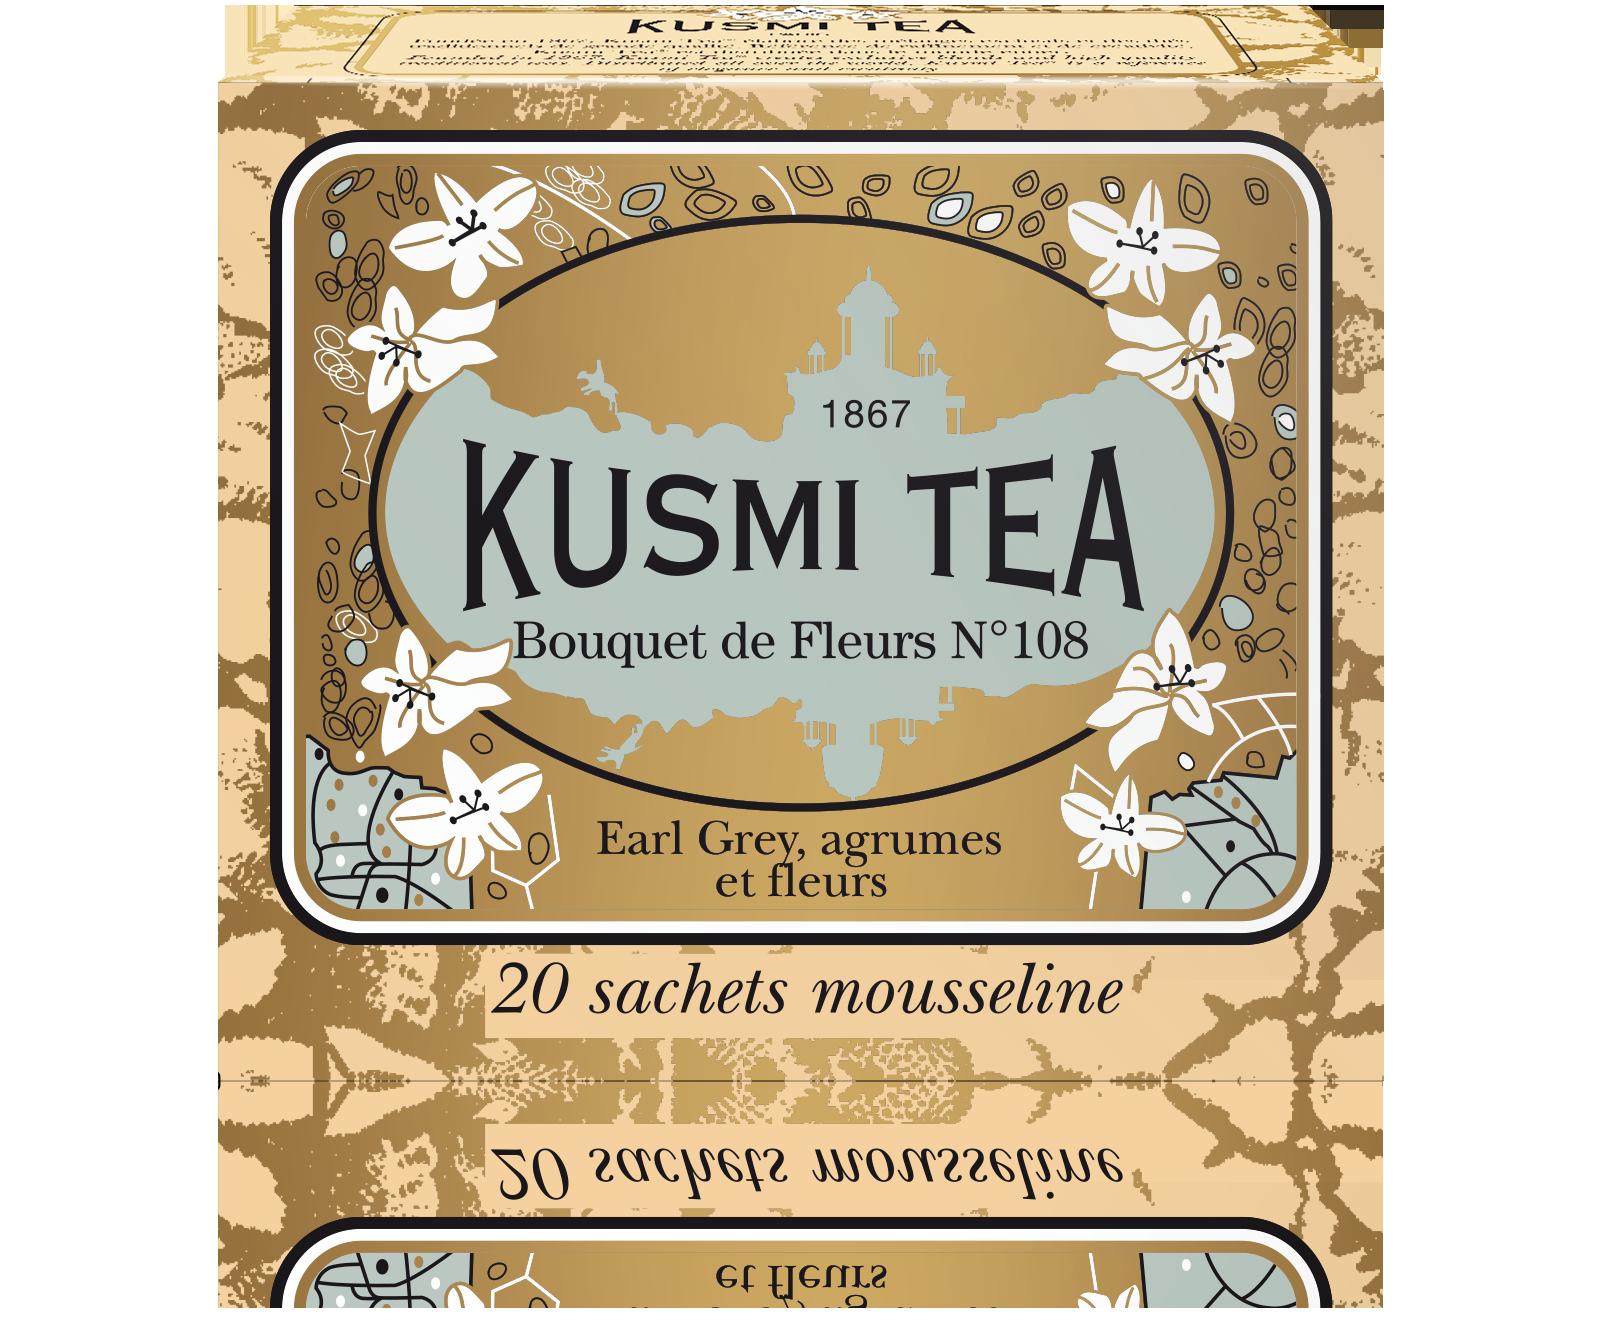 Earl Grey - Bouquet de Fleurs N°108 - Sachets - Kusmi Tea